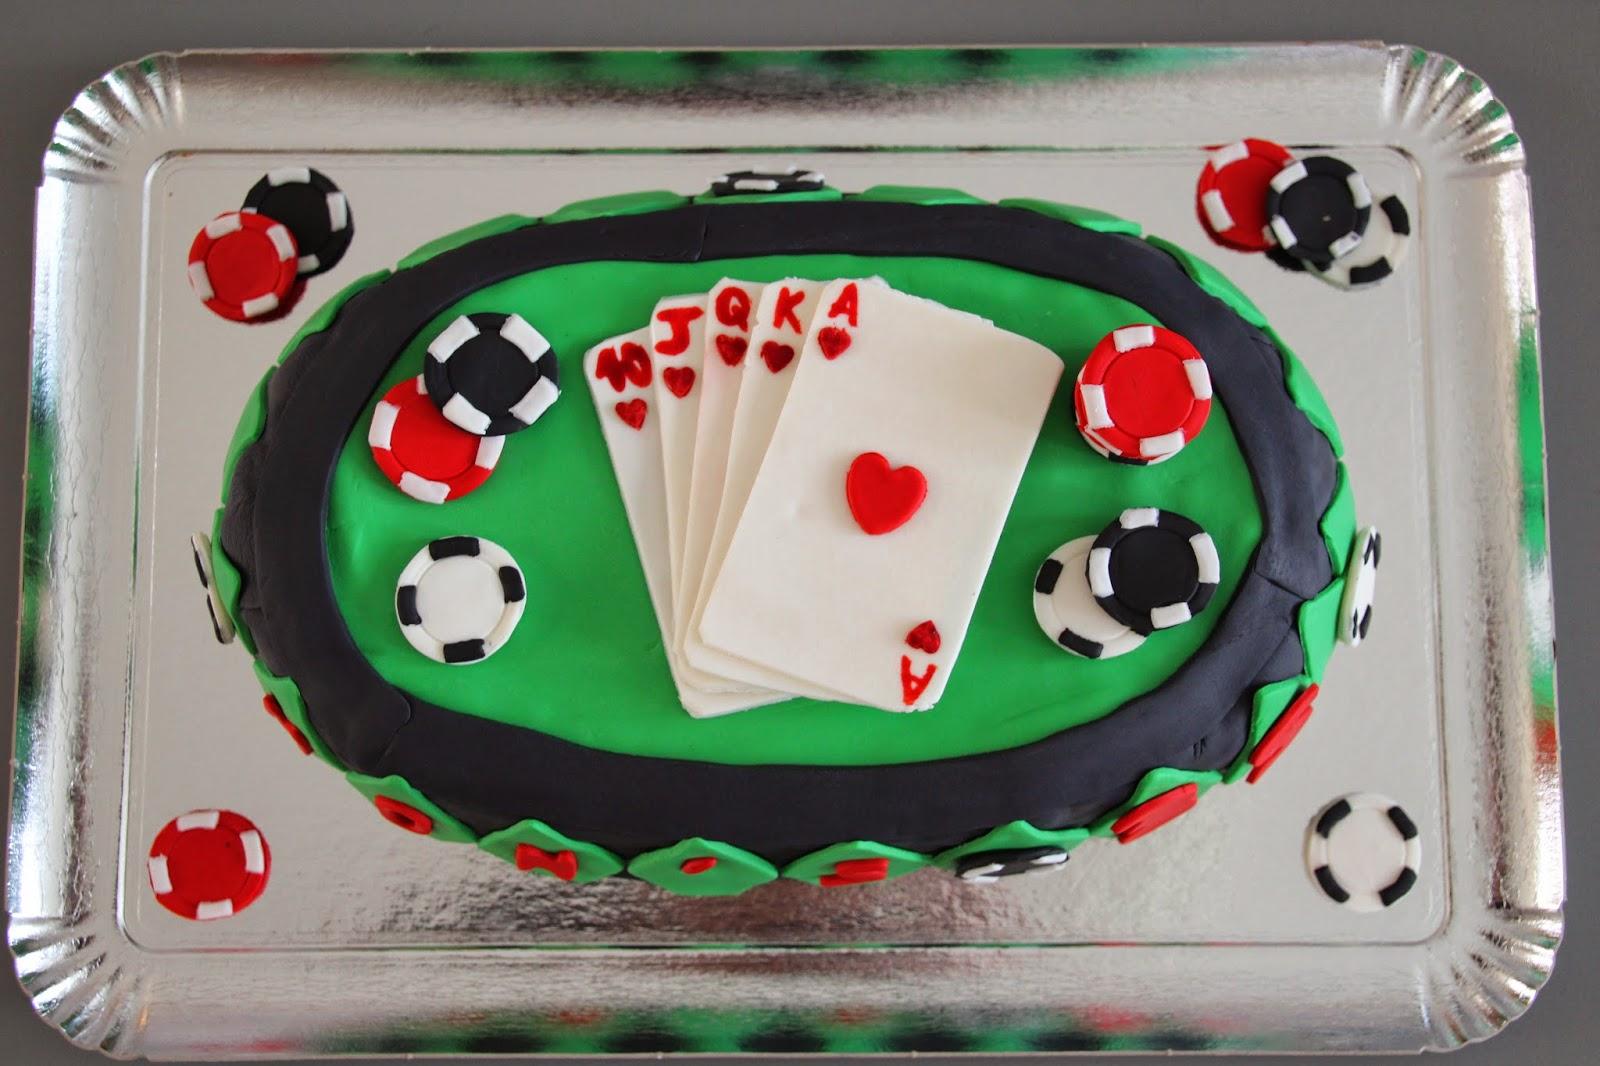 poker jeu de cartes jetons g teaux by lilmia. Black Bedroom Furniture Sets. Home Design Ideas